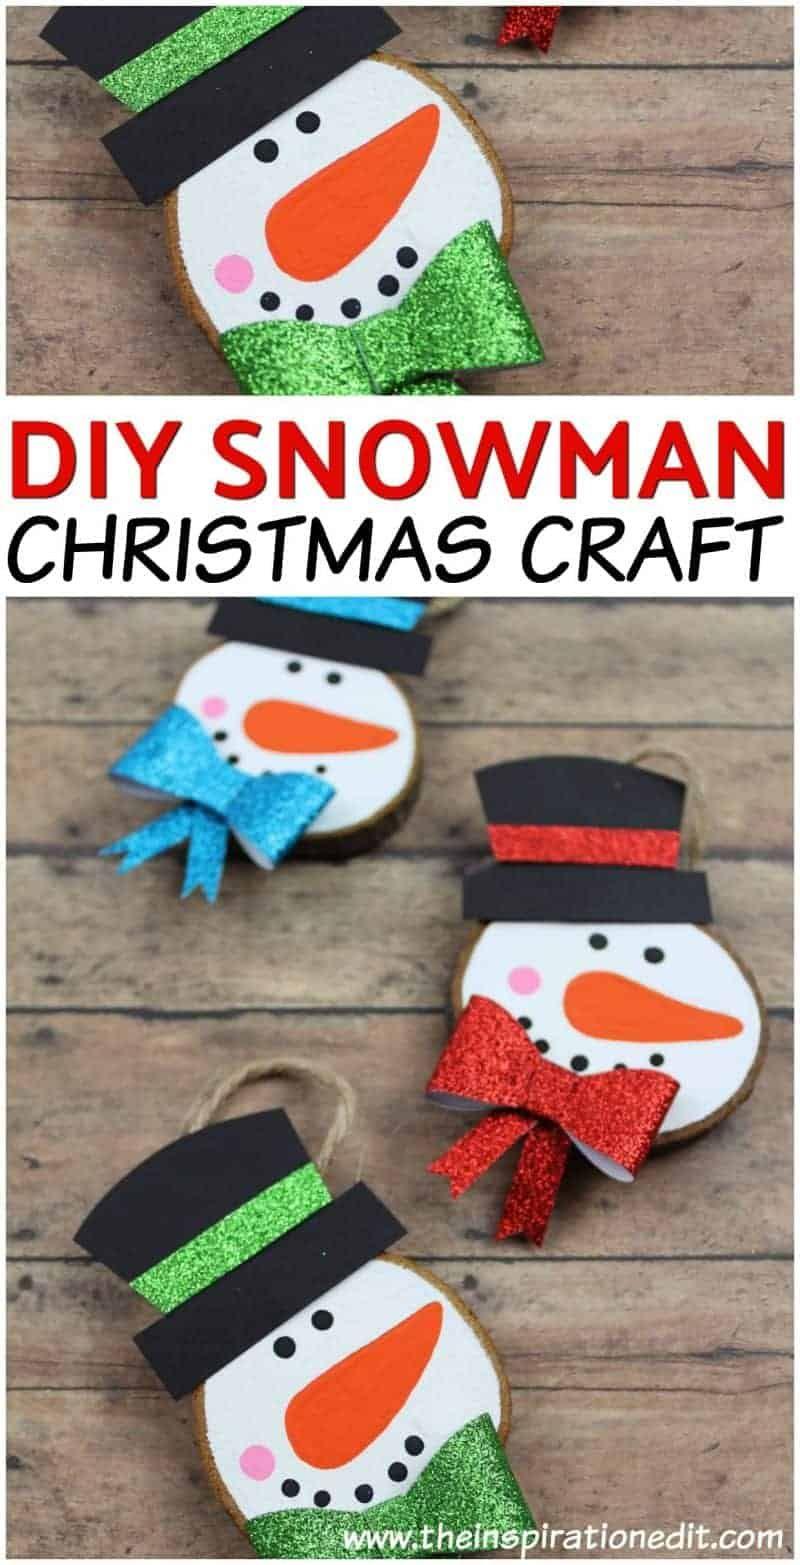 Diy Snowman Ornament For Kids Diy Snowman Decorations Christmas Card Crafts Diy Snowman